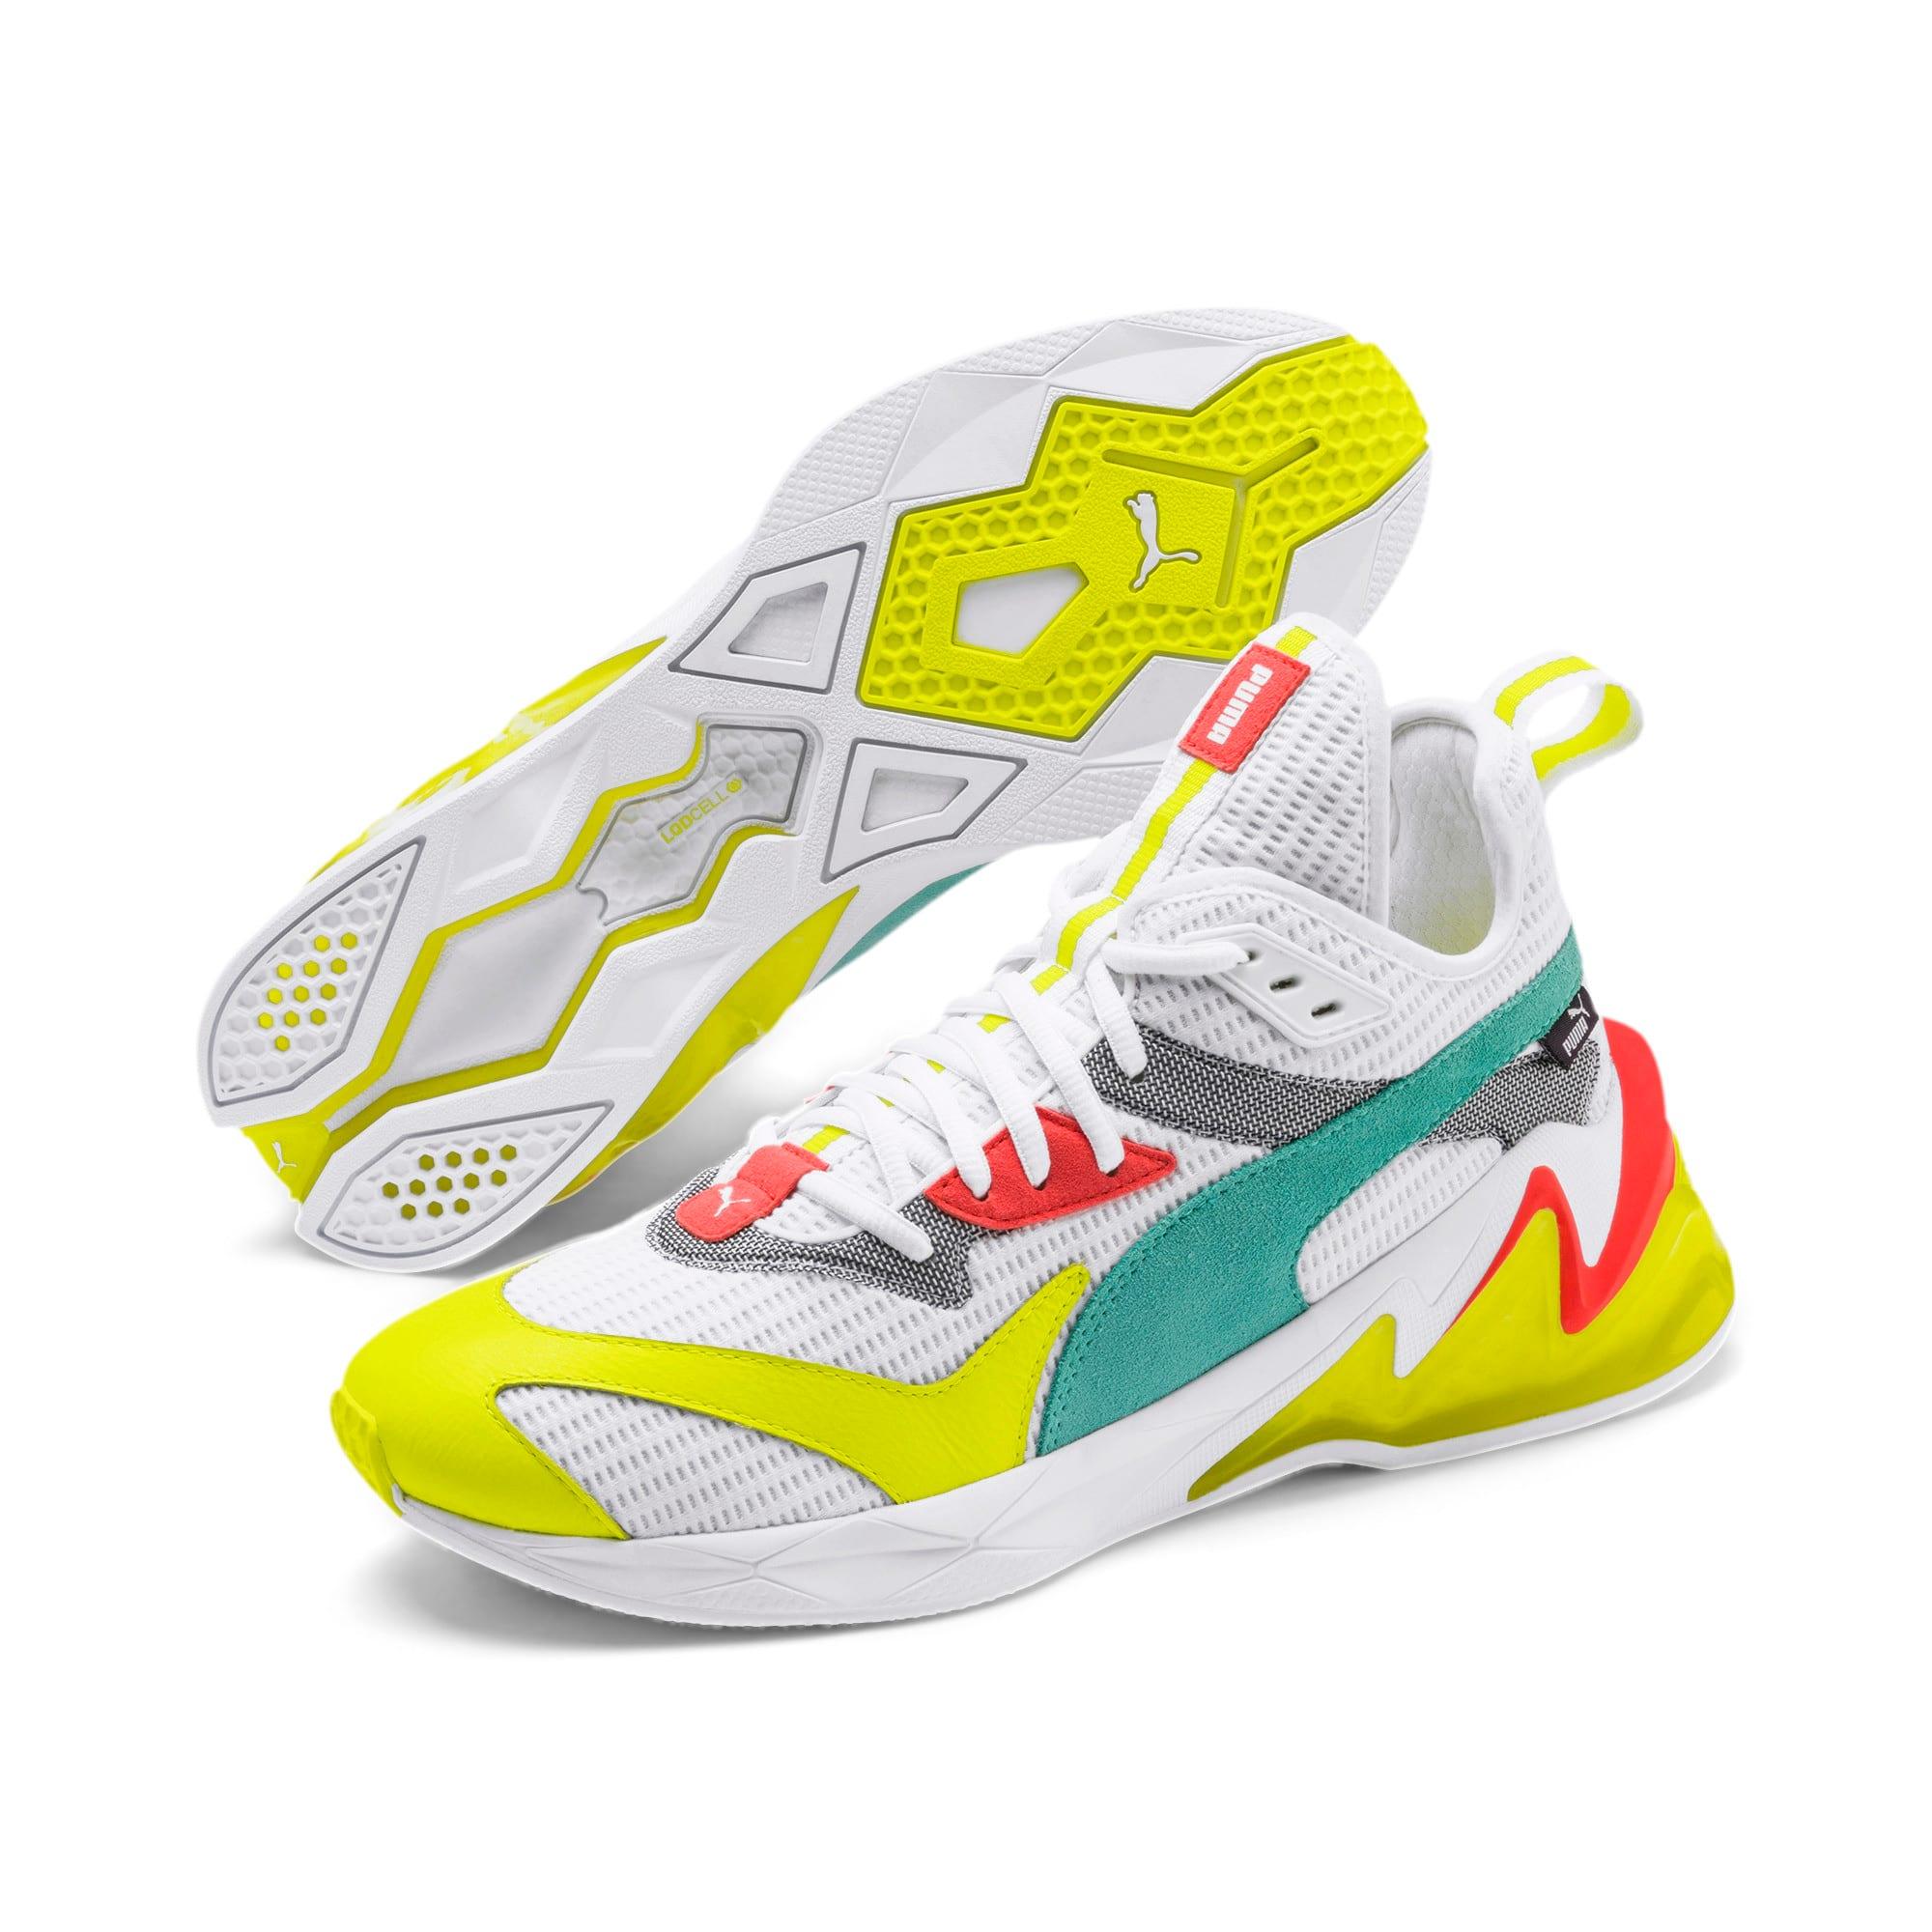 Miniatura 3 de Zapatos de entrenamientoLQDCELL Origin para hombre, Puma White-Yellow Alert, mediano